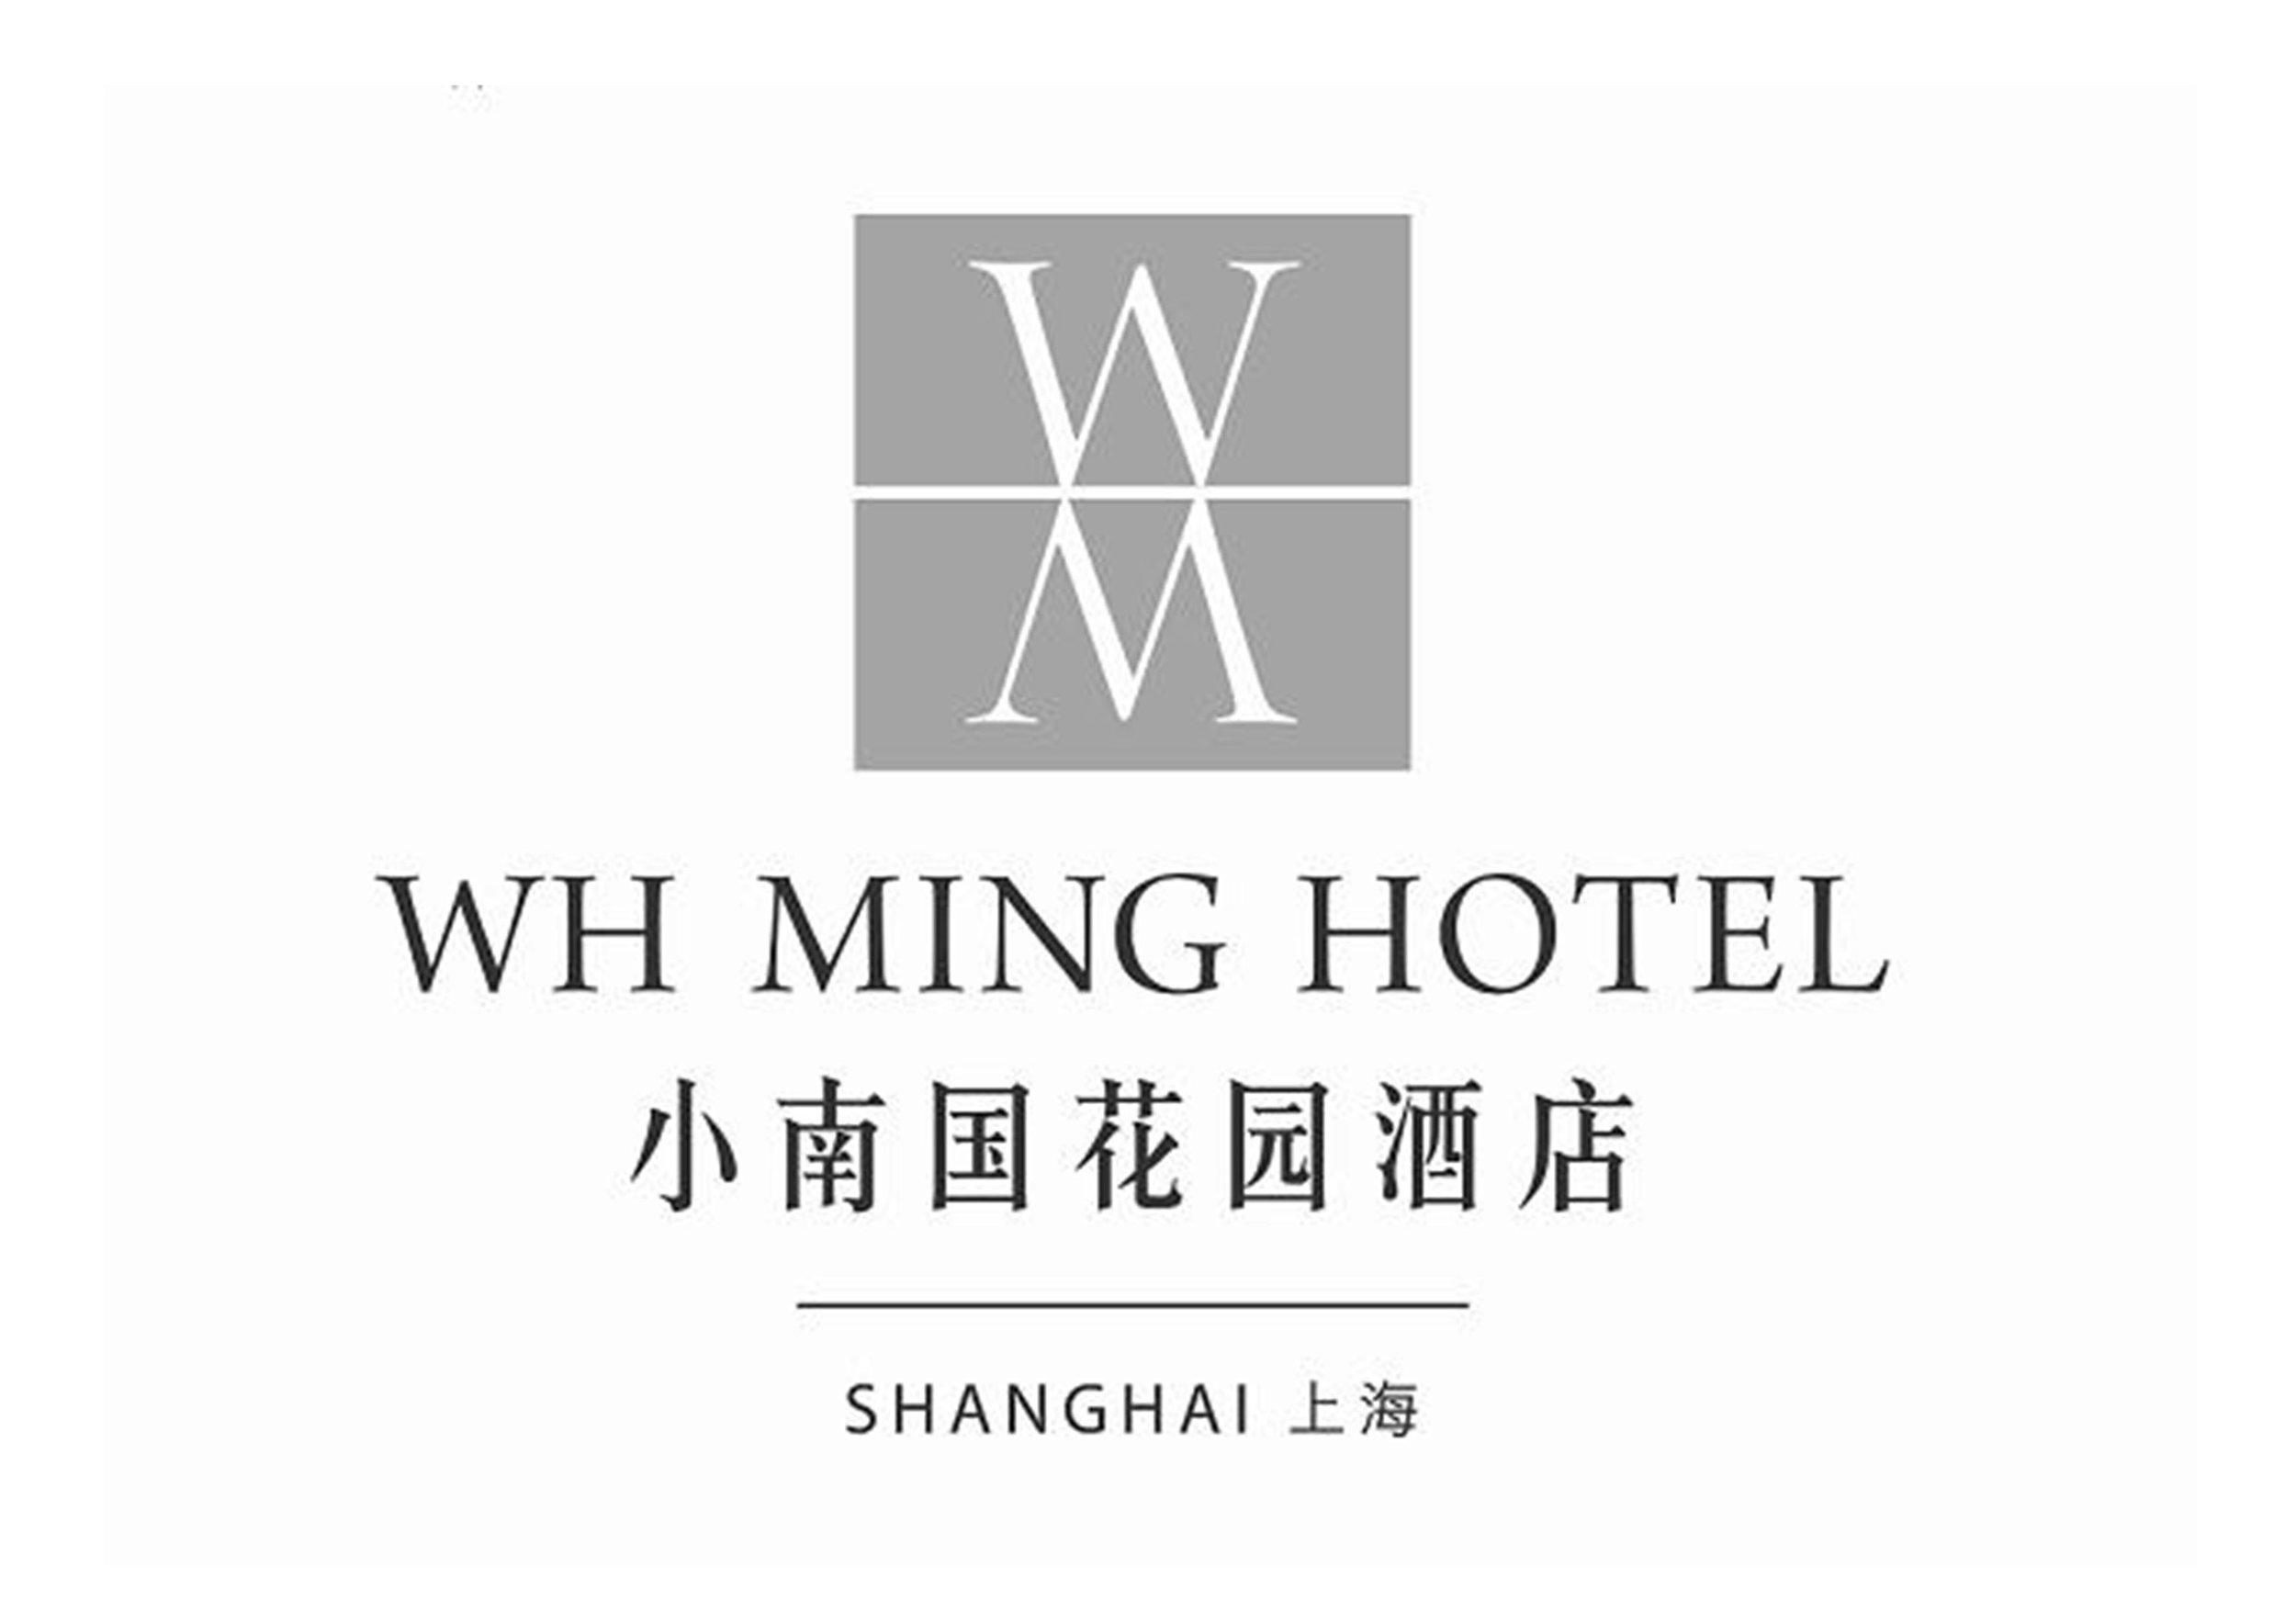 WH Ming Hotel Shanghai.jpg